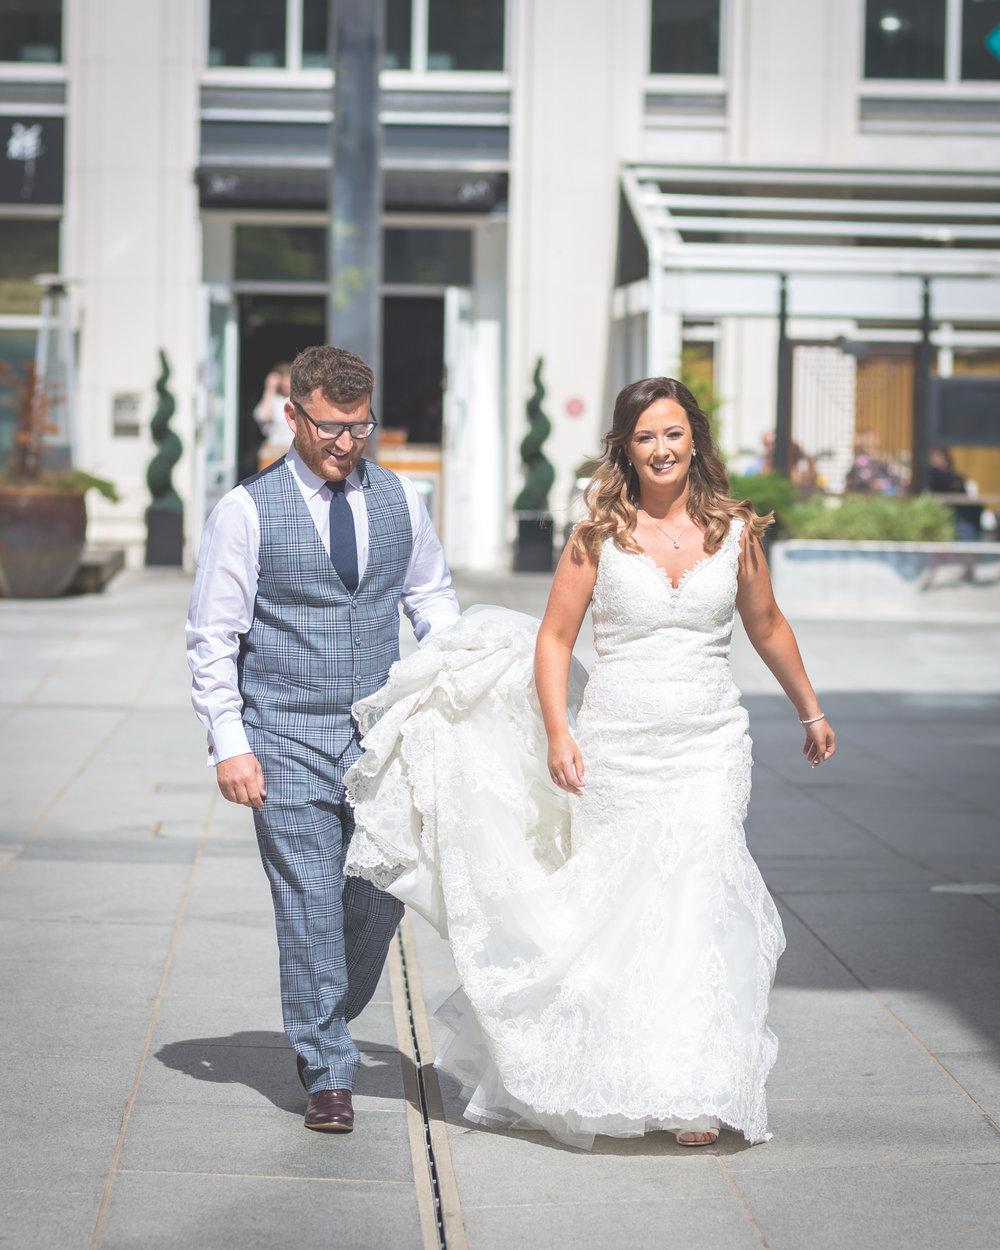 Brian McEwan | Northern Ireland Wedding Photographer | Rebecca & Michael | Portraits-103.jpg